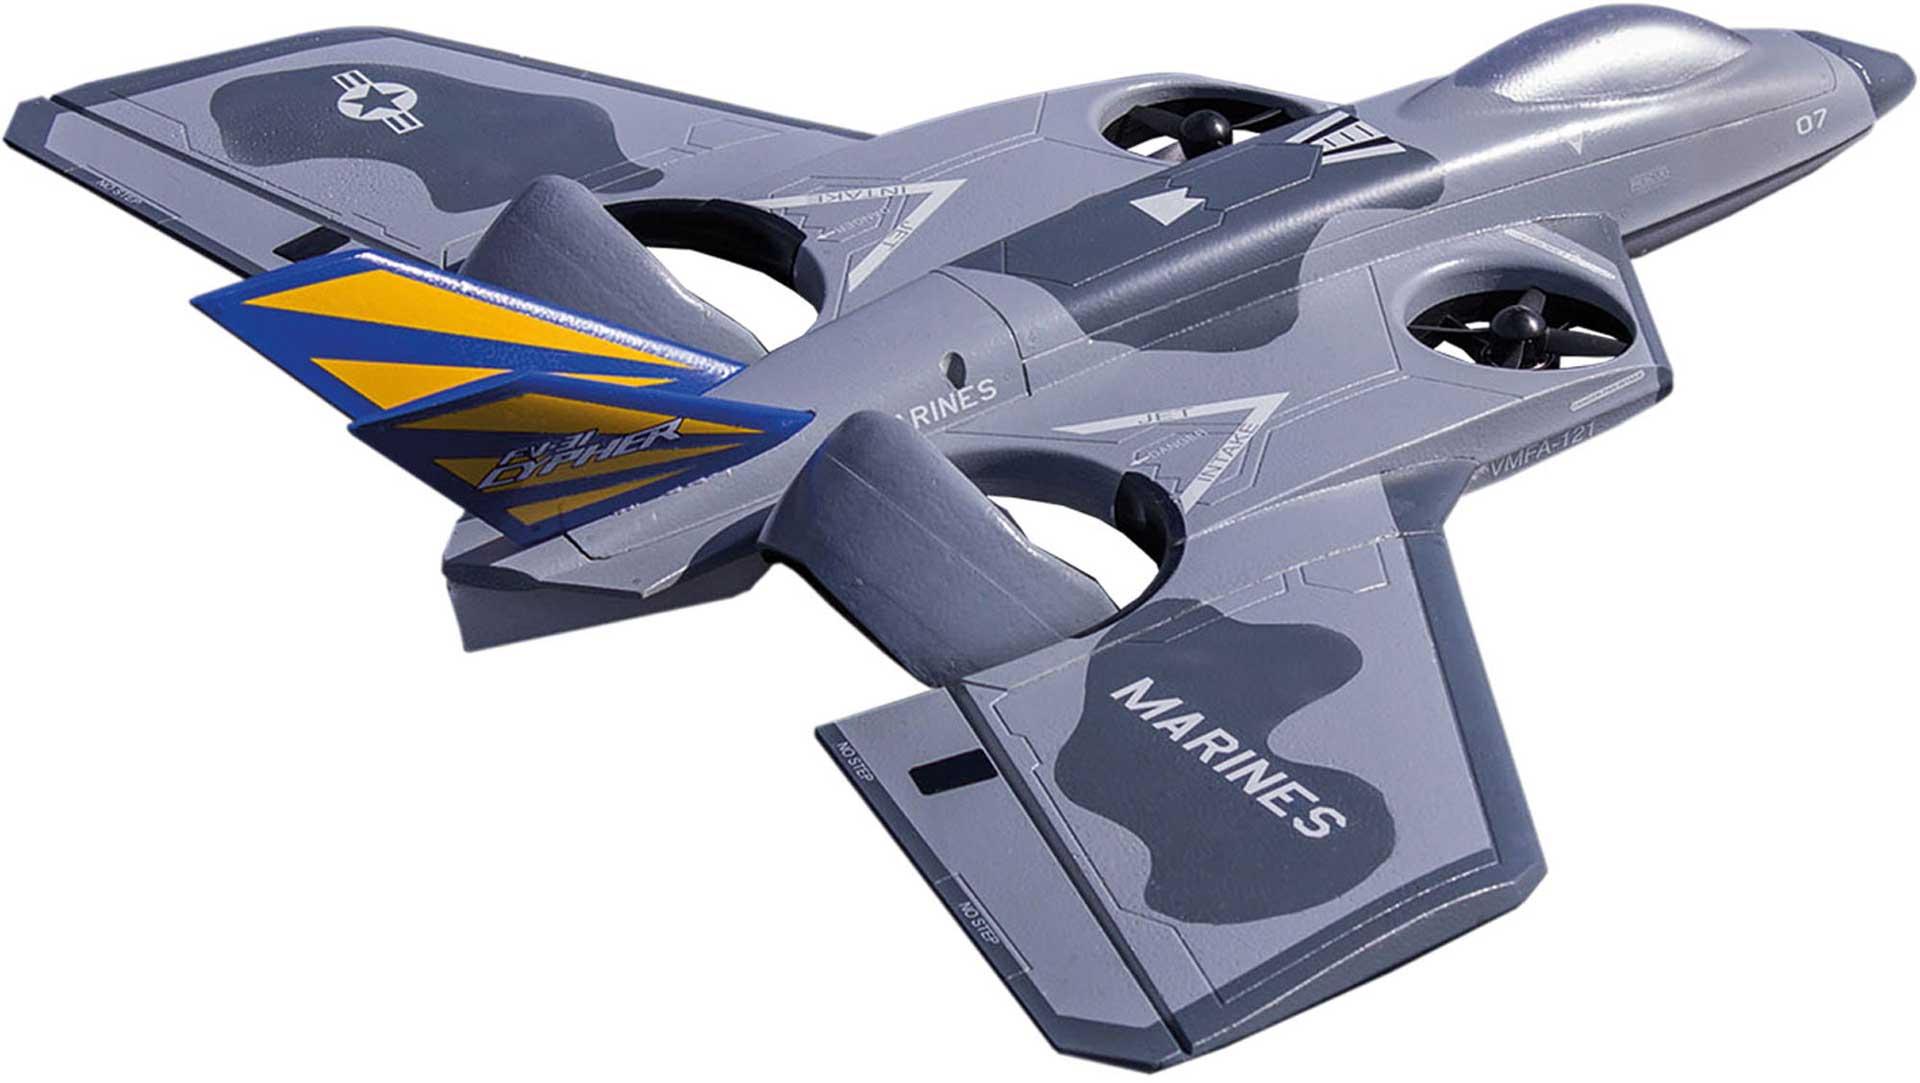 PREMIER AIRCRAFT FV-31 CYPHER VTOL SUPER PNP GREY/MARINE